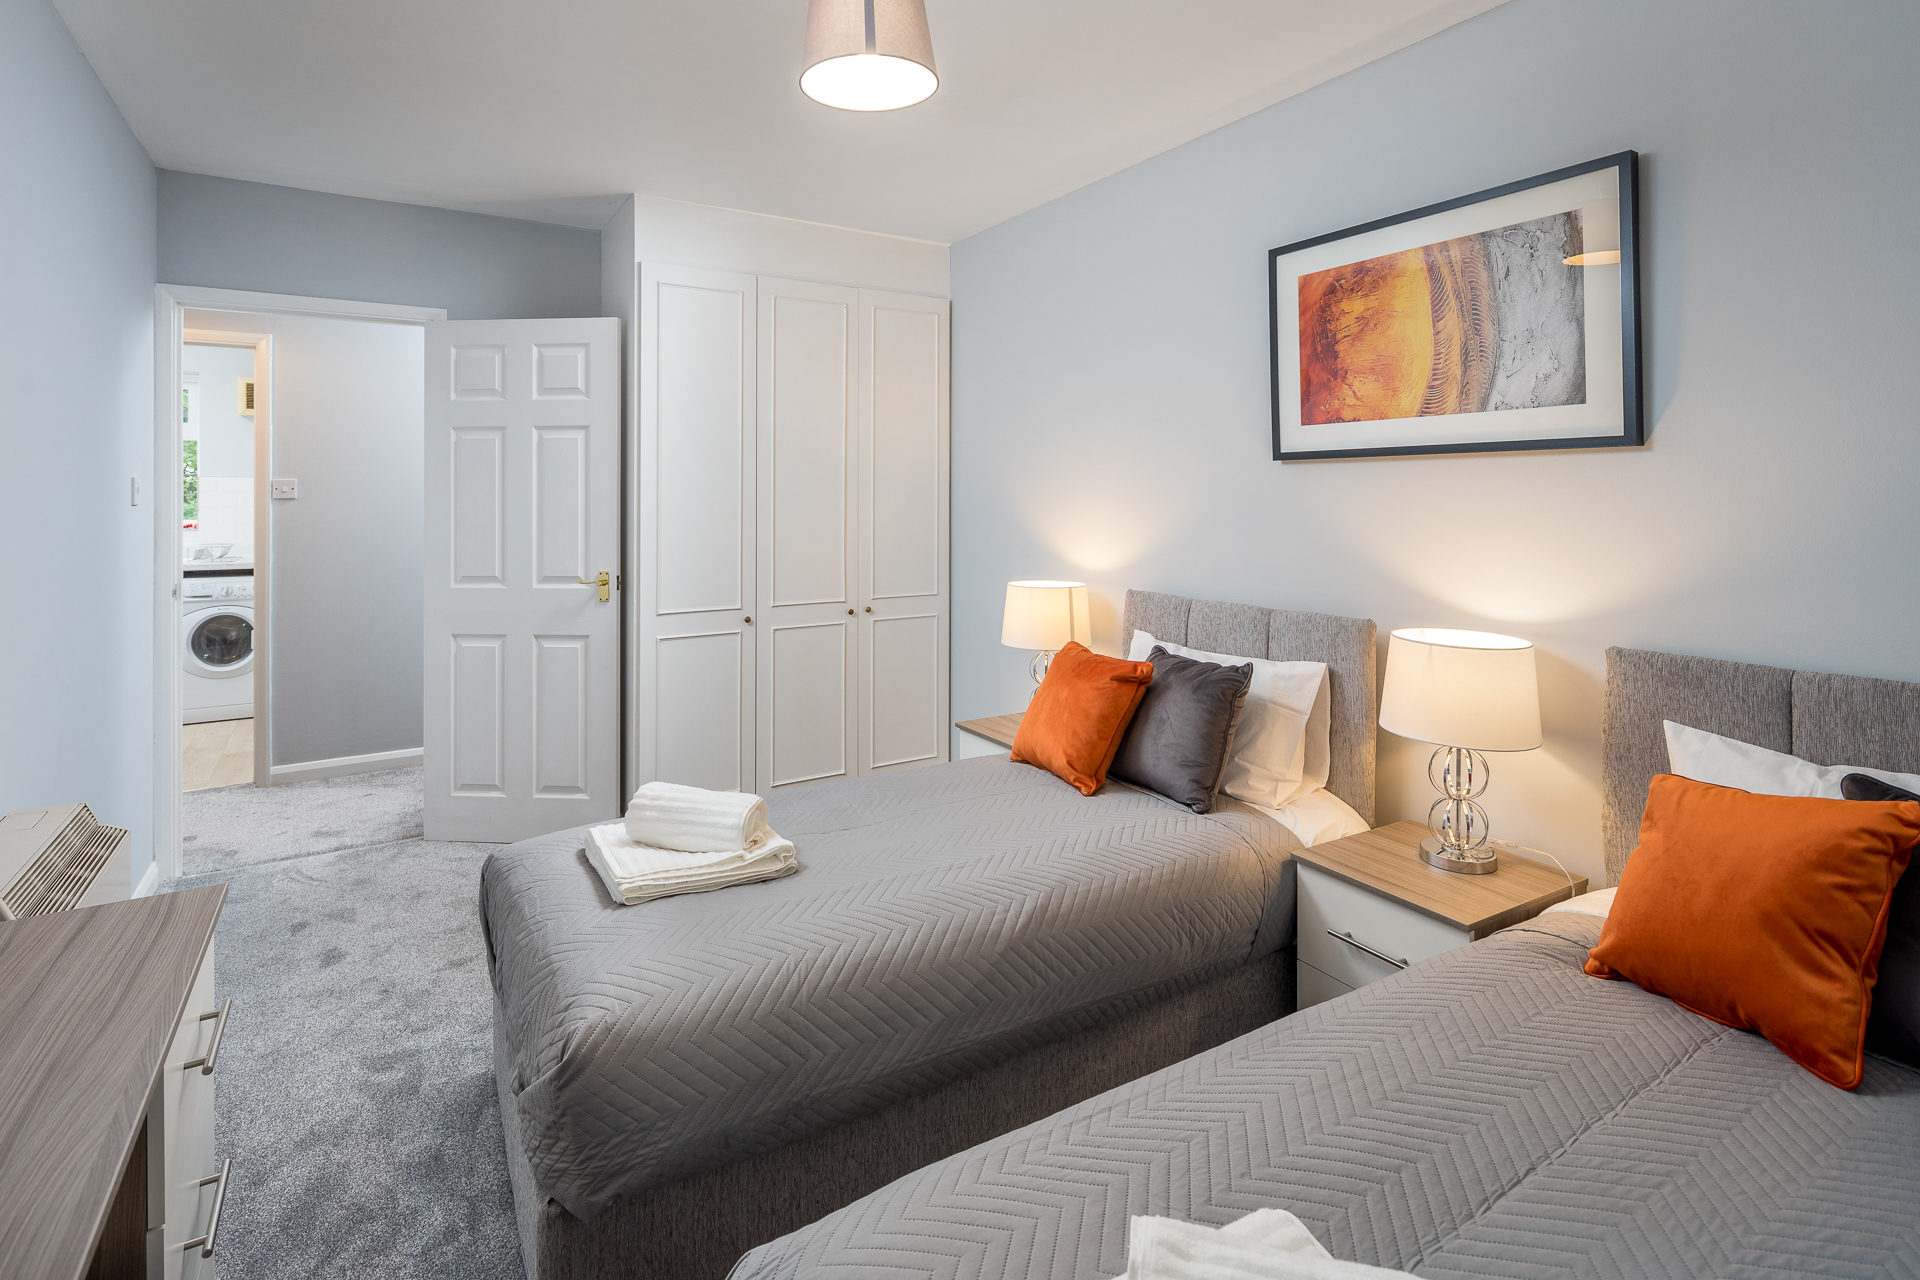 Twin beds at Crawley Centre Apartment, Southgate, Crawley